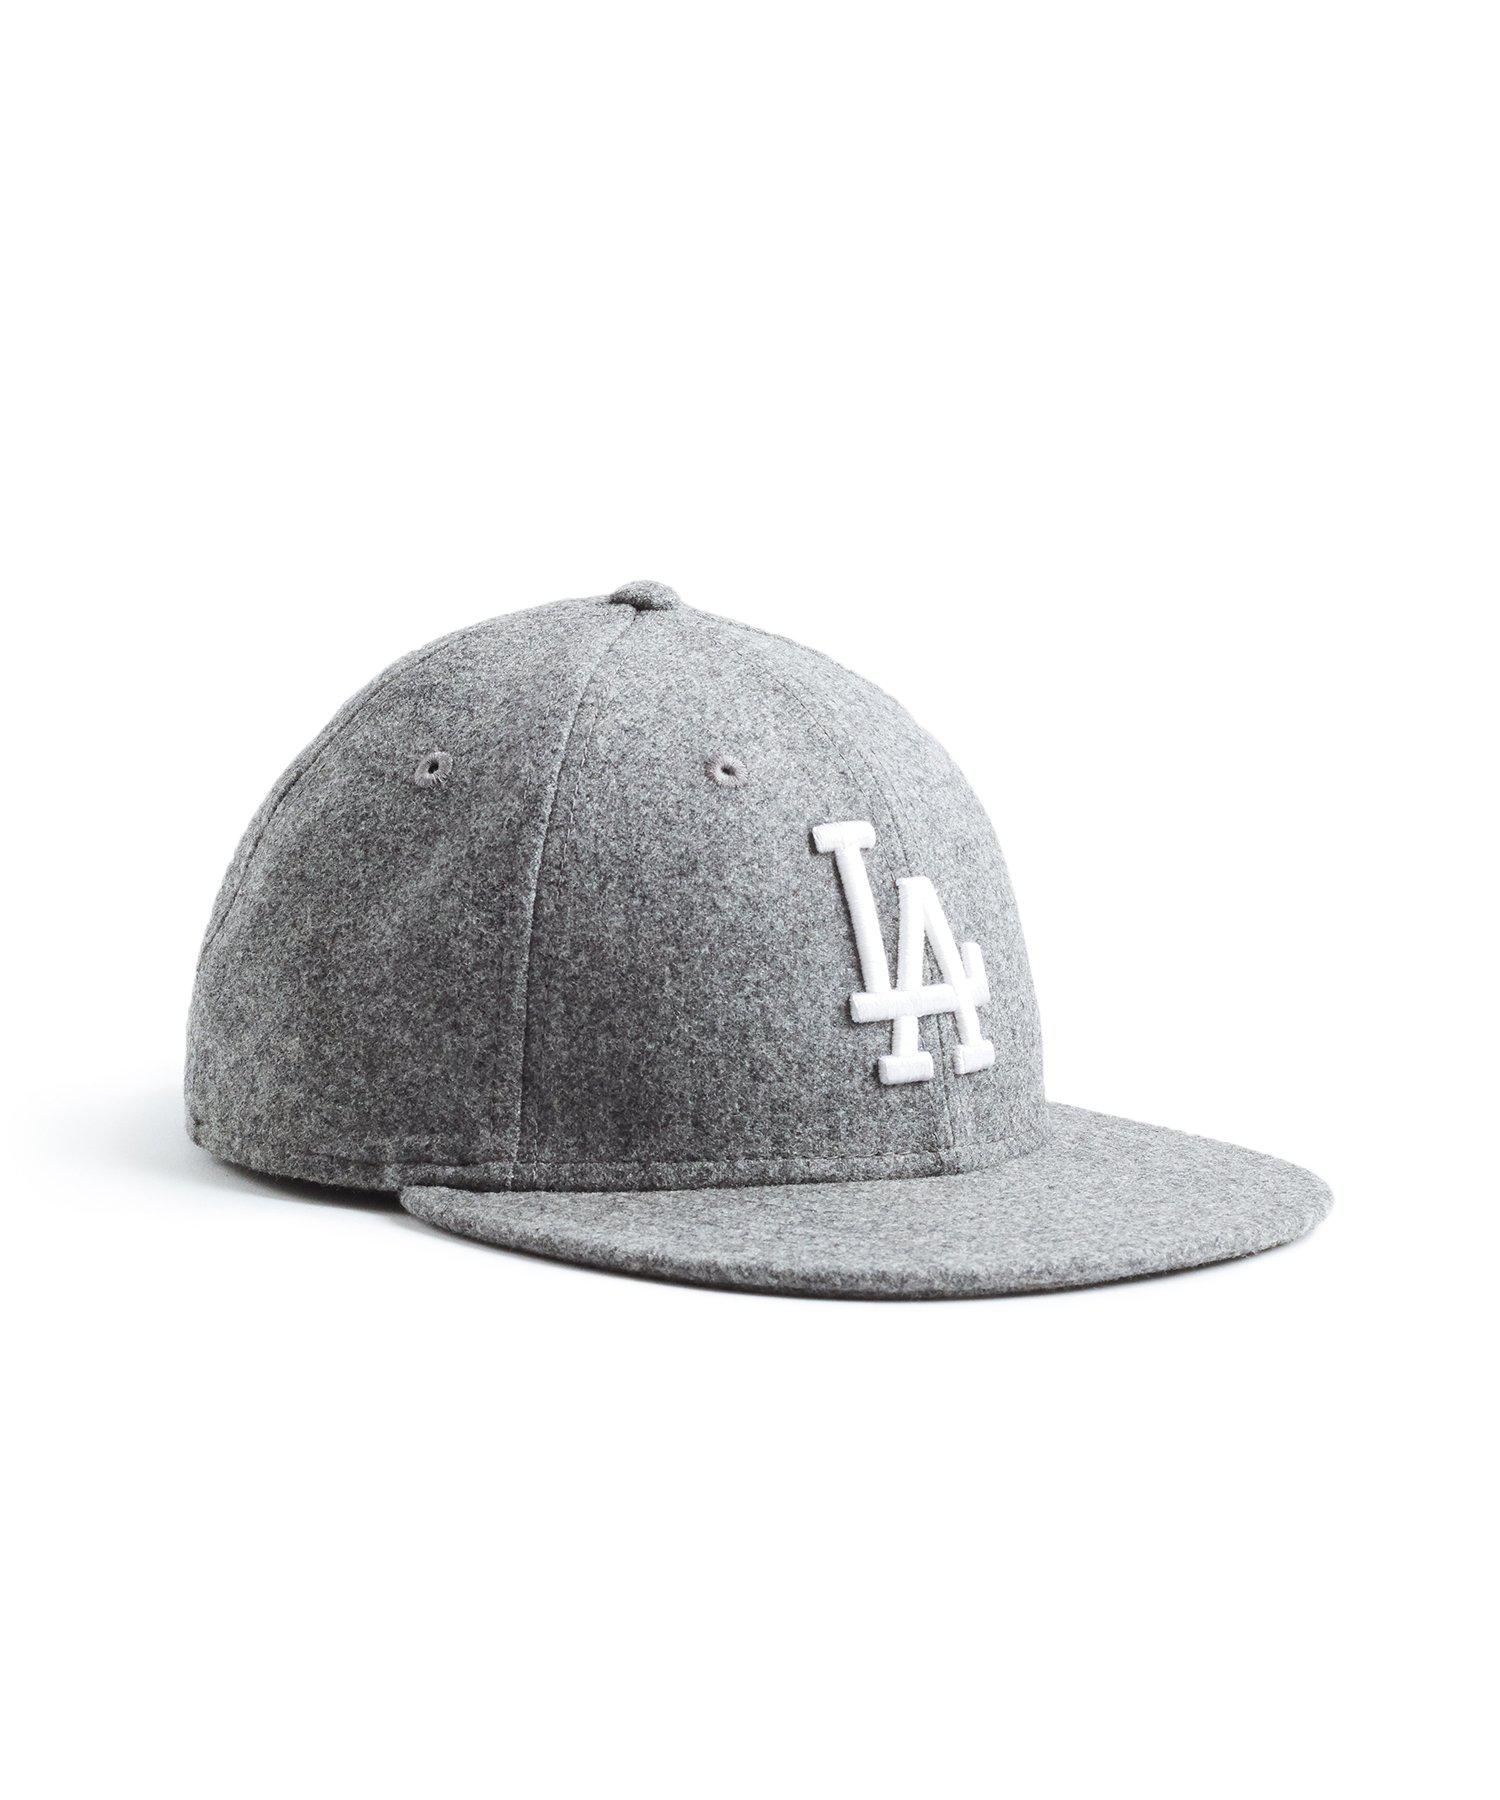 Grey La Dodgers Hat